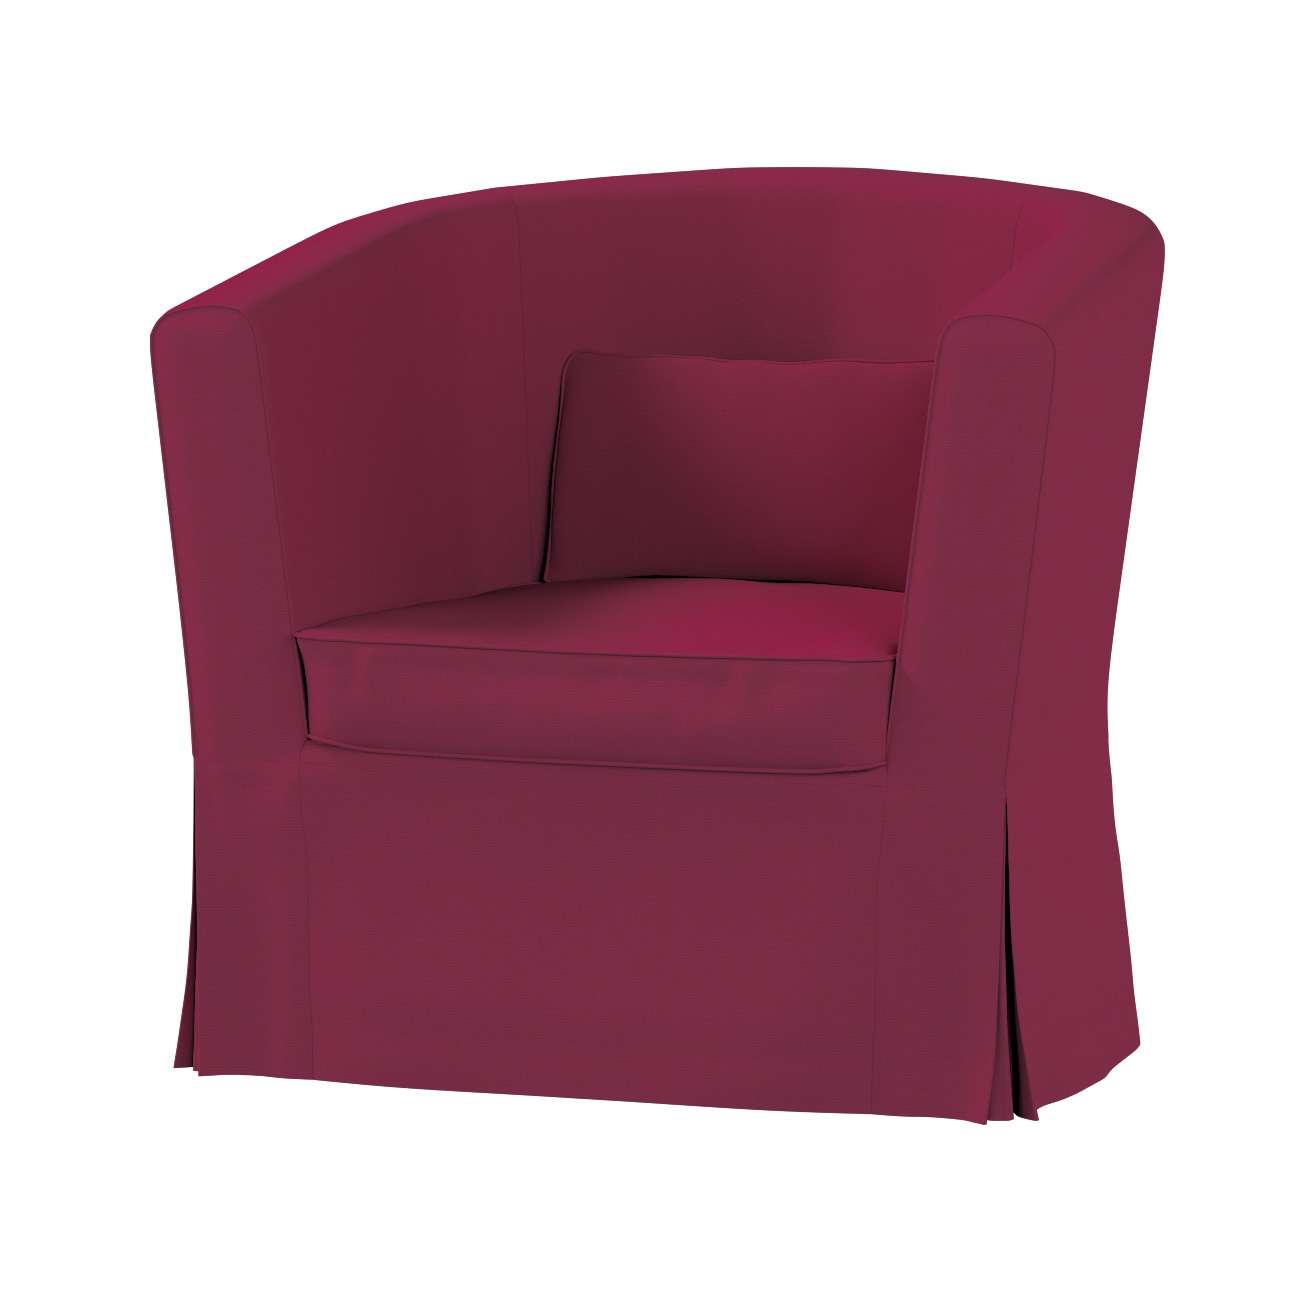 Potah na křeslo IKEA Ektorp Tullsta křeslo Ektorp Tullsta v kolekci Cotton Panama, látka: 702-32